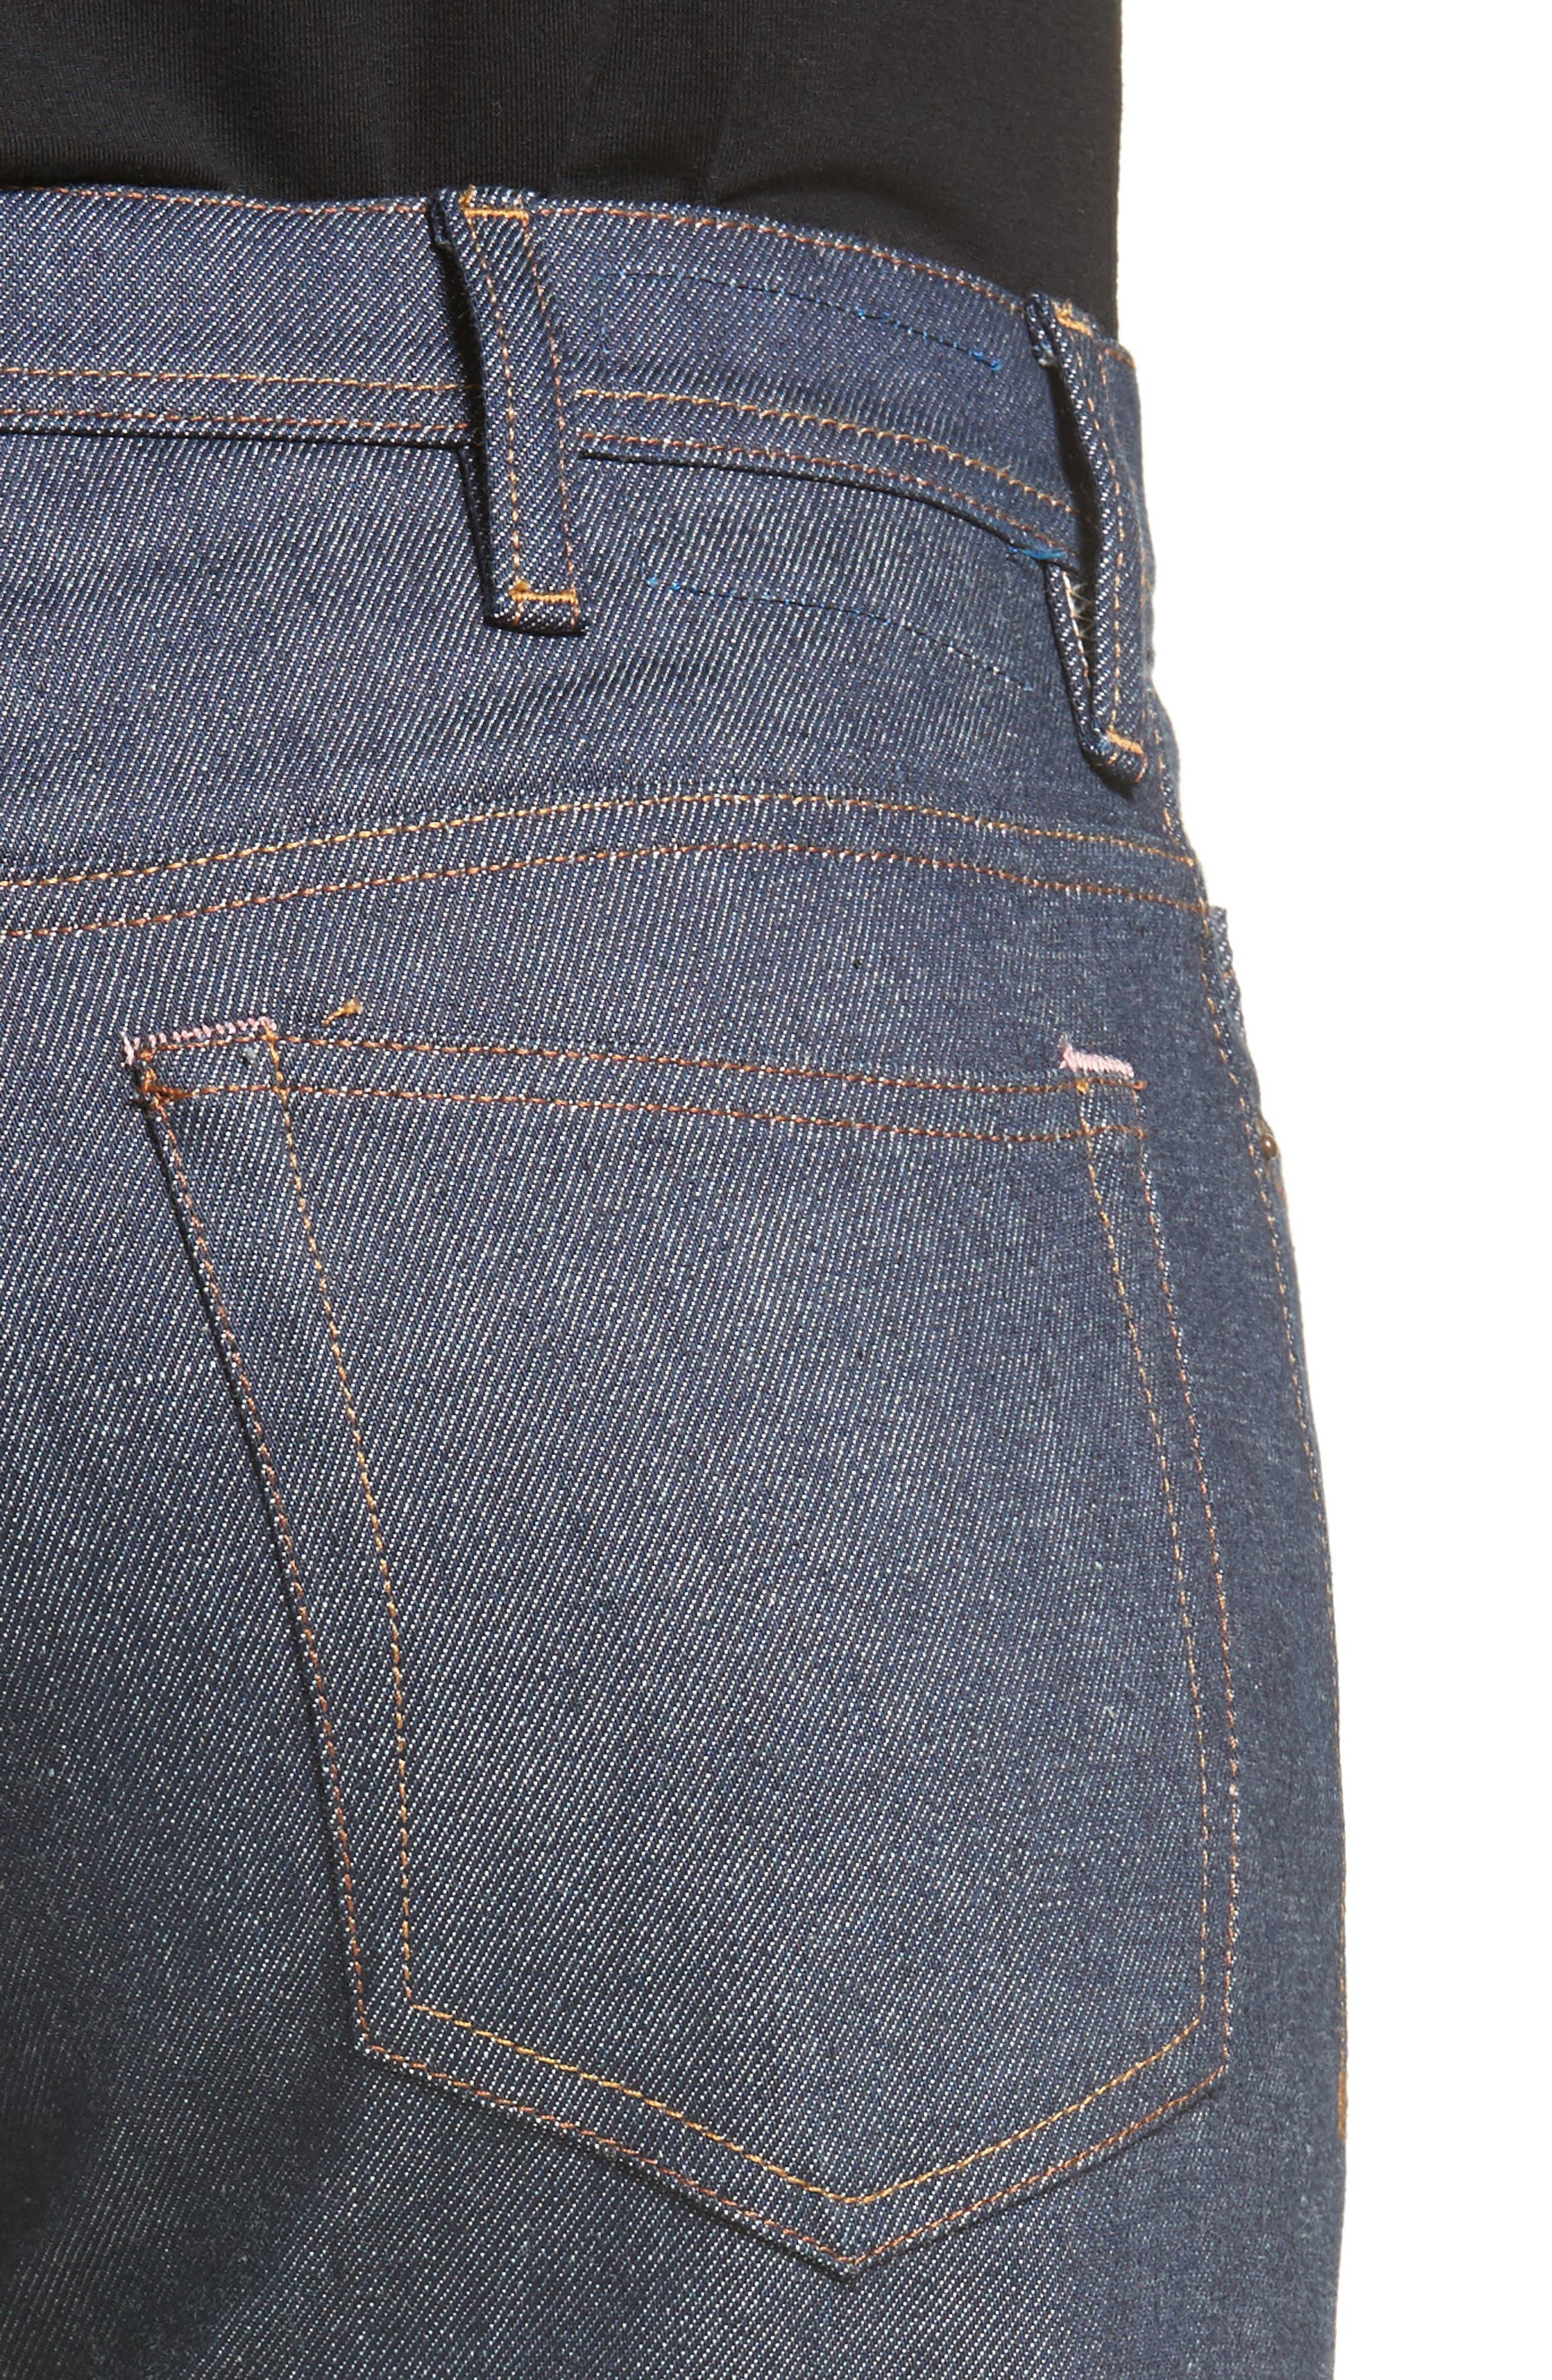 River Slim Tapered Leg Jeans,                             Alternate thumbnail 4, color,                             INDIGO